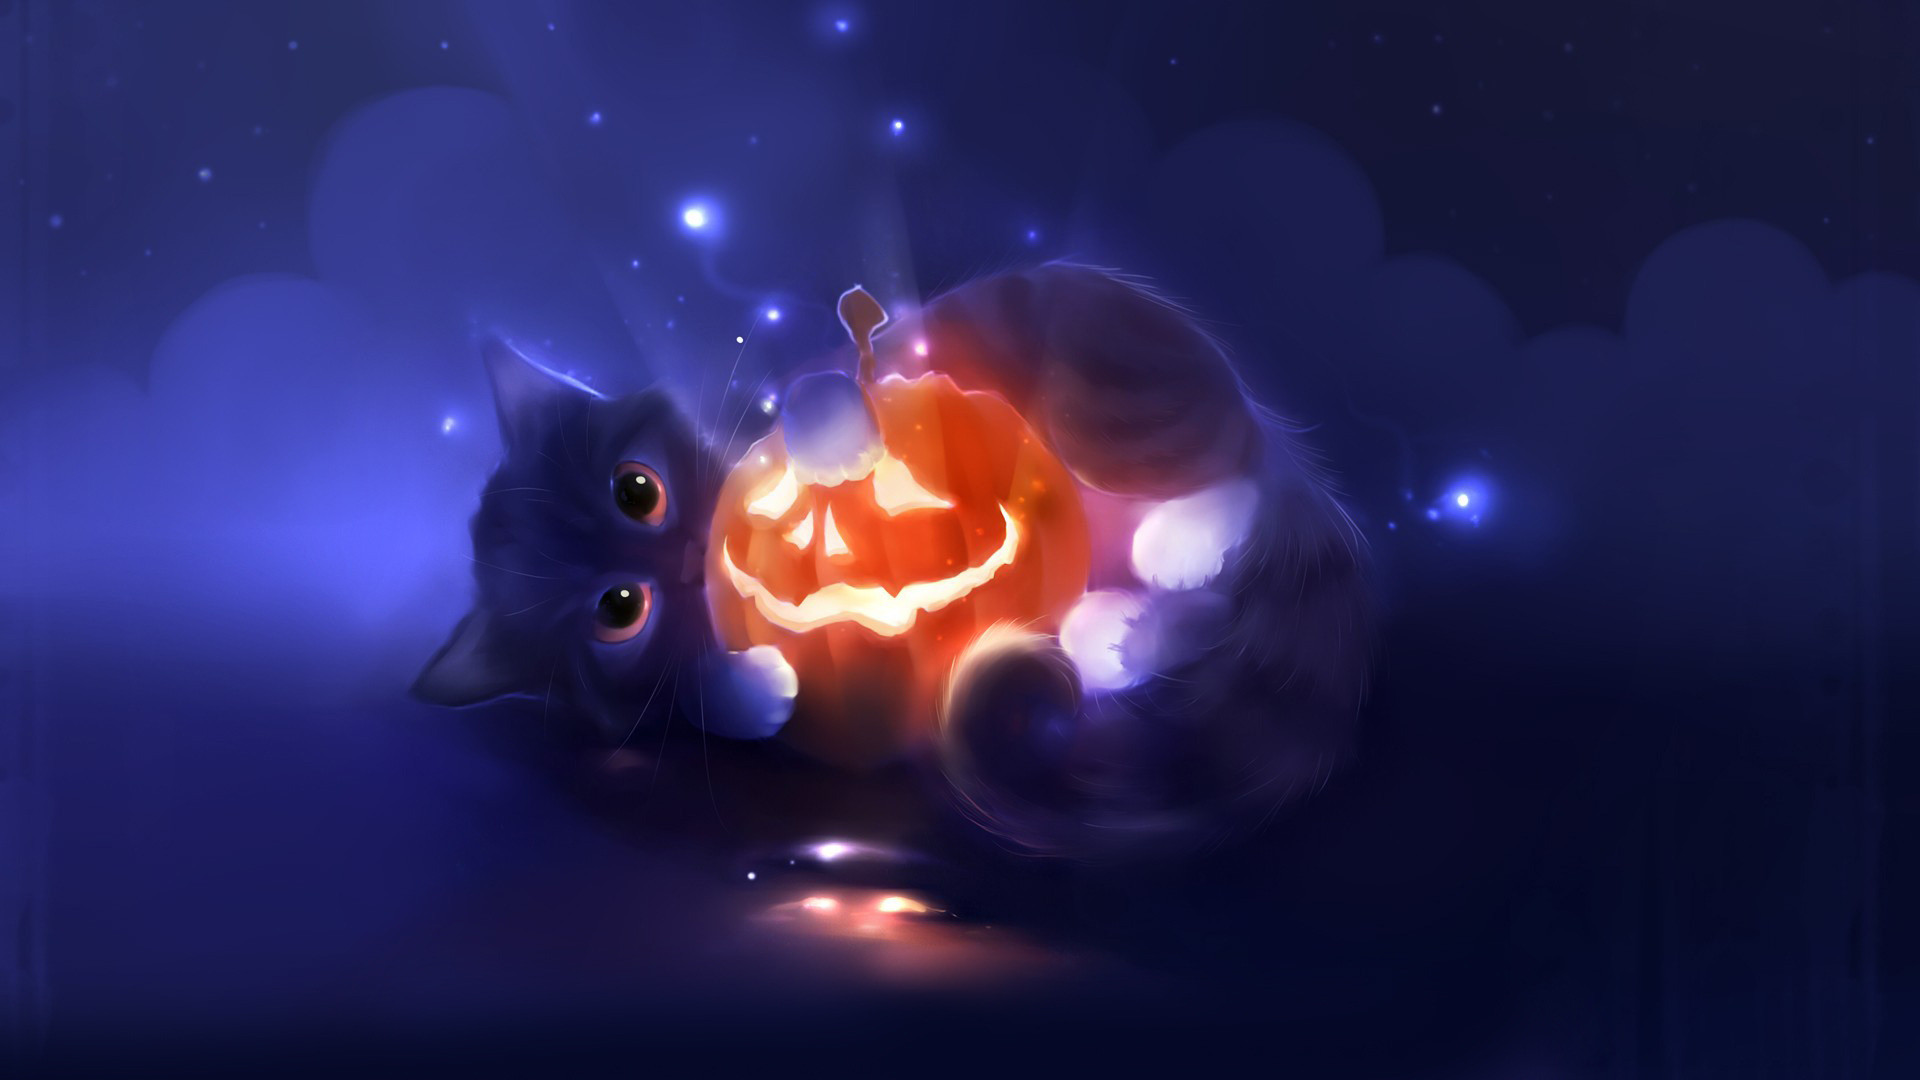 Cute Cat Halloween Wallpaper 65 Images